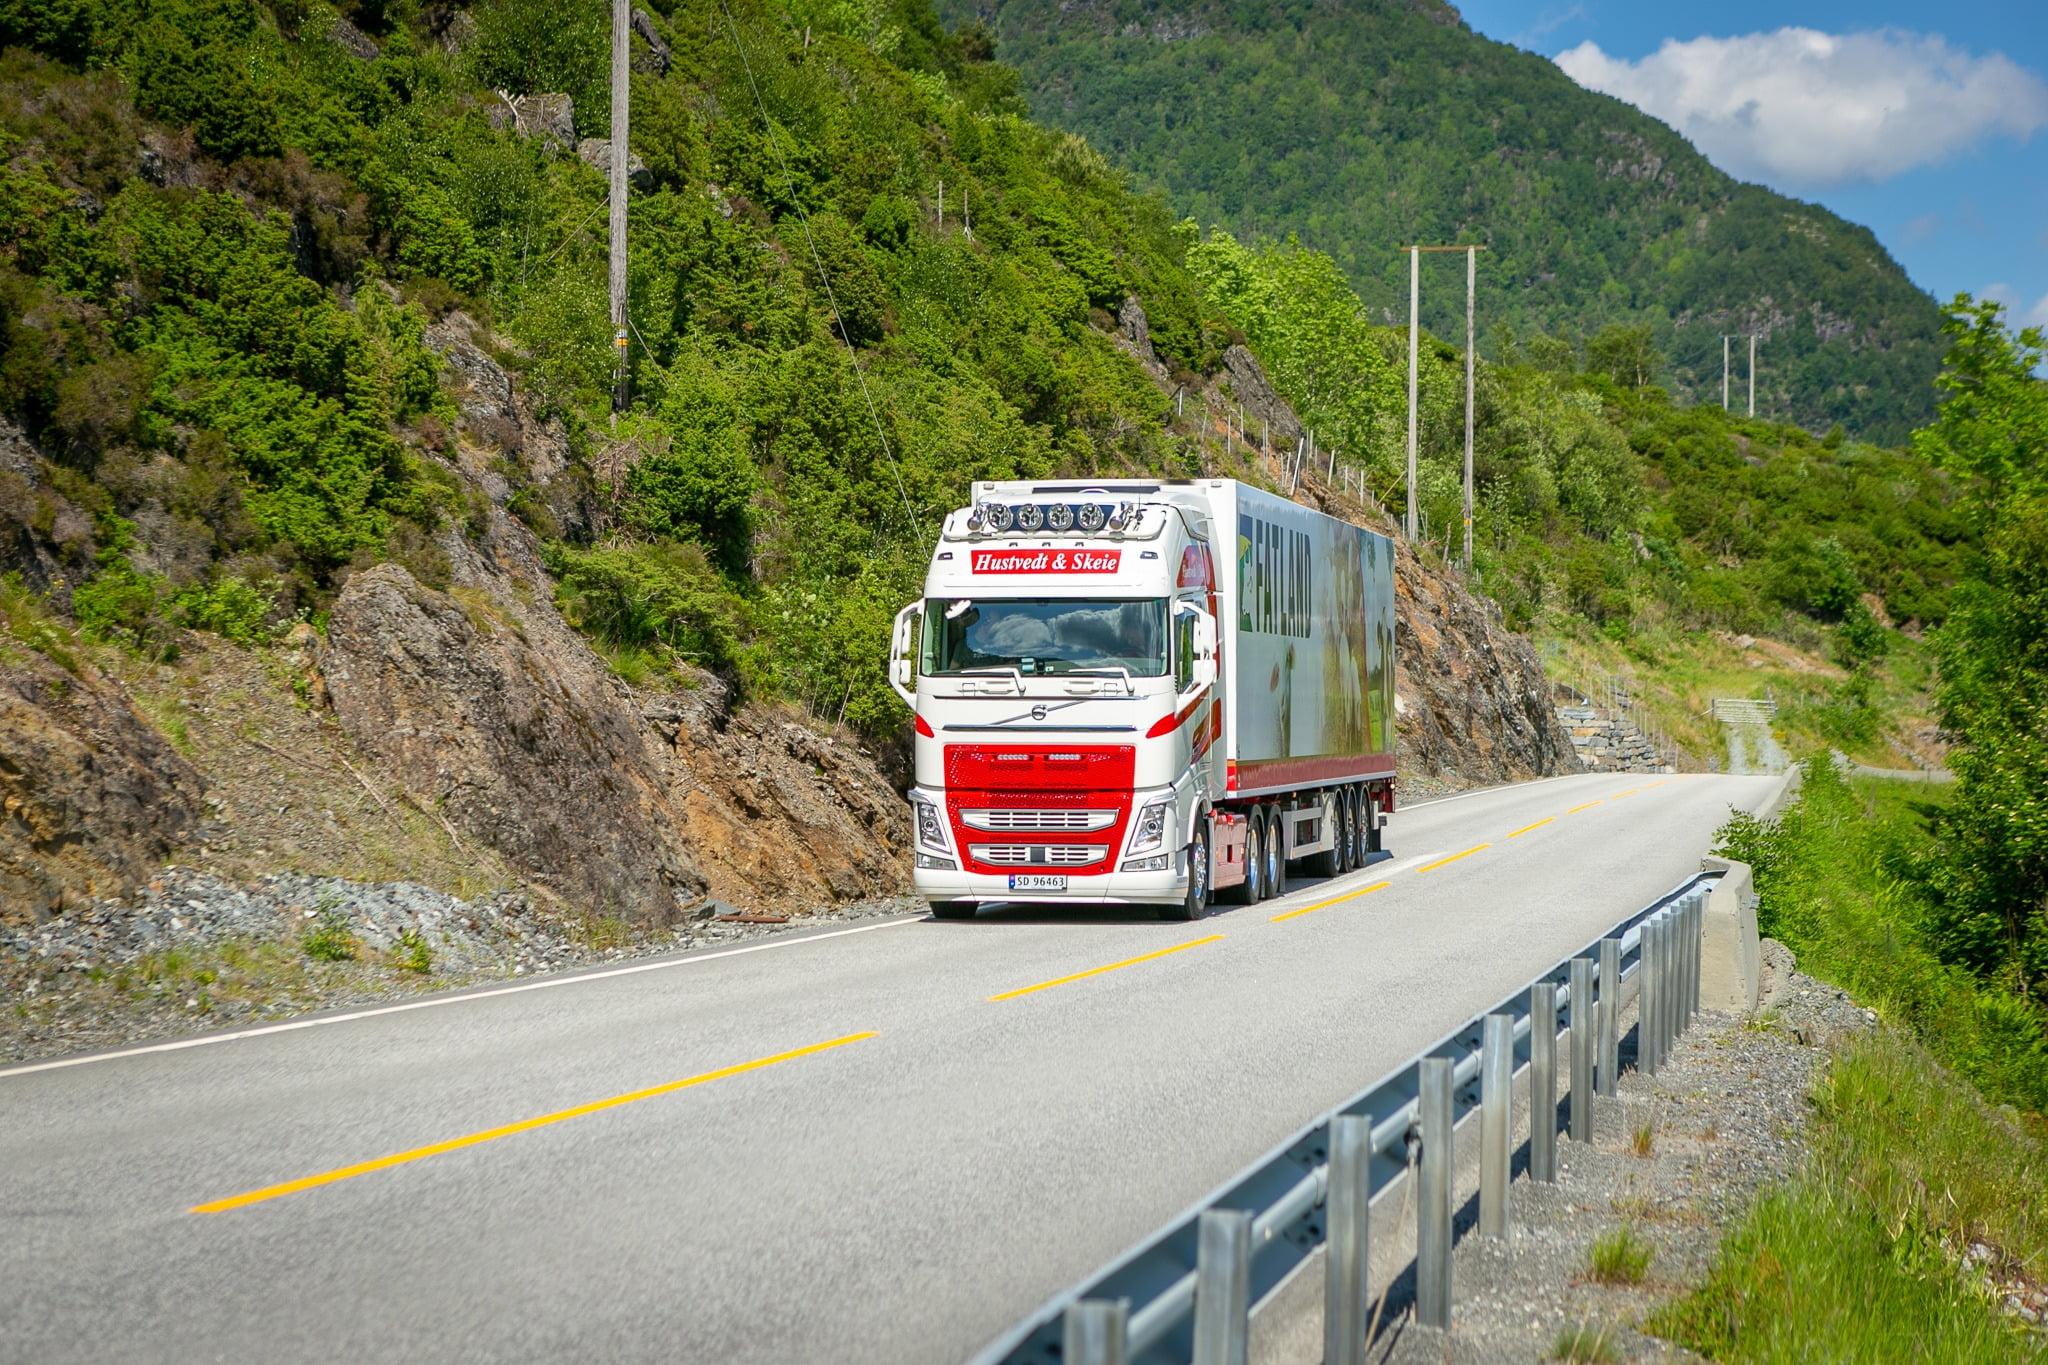 Land vehicle, Automotive lighting, Plant, Mountain, Tire, Wheel, Cloud, Truck